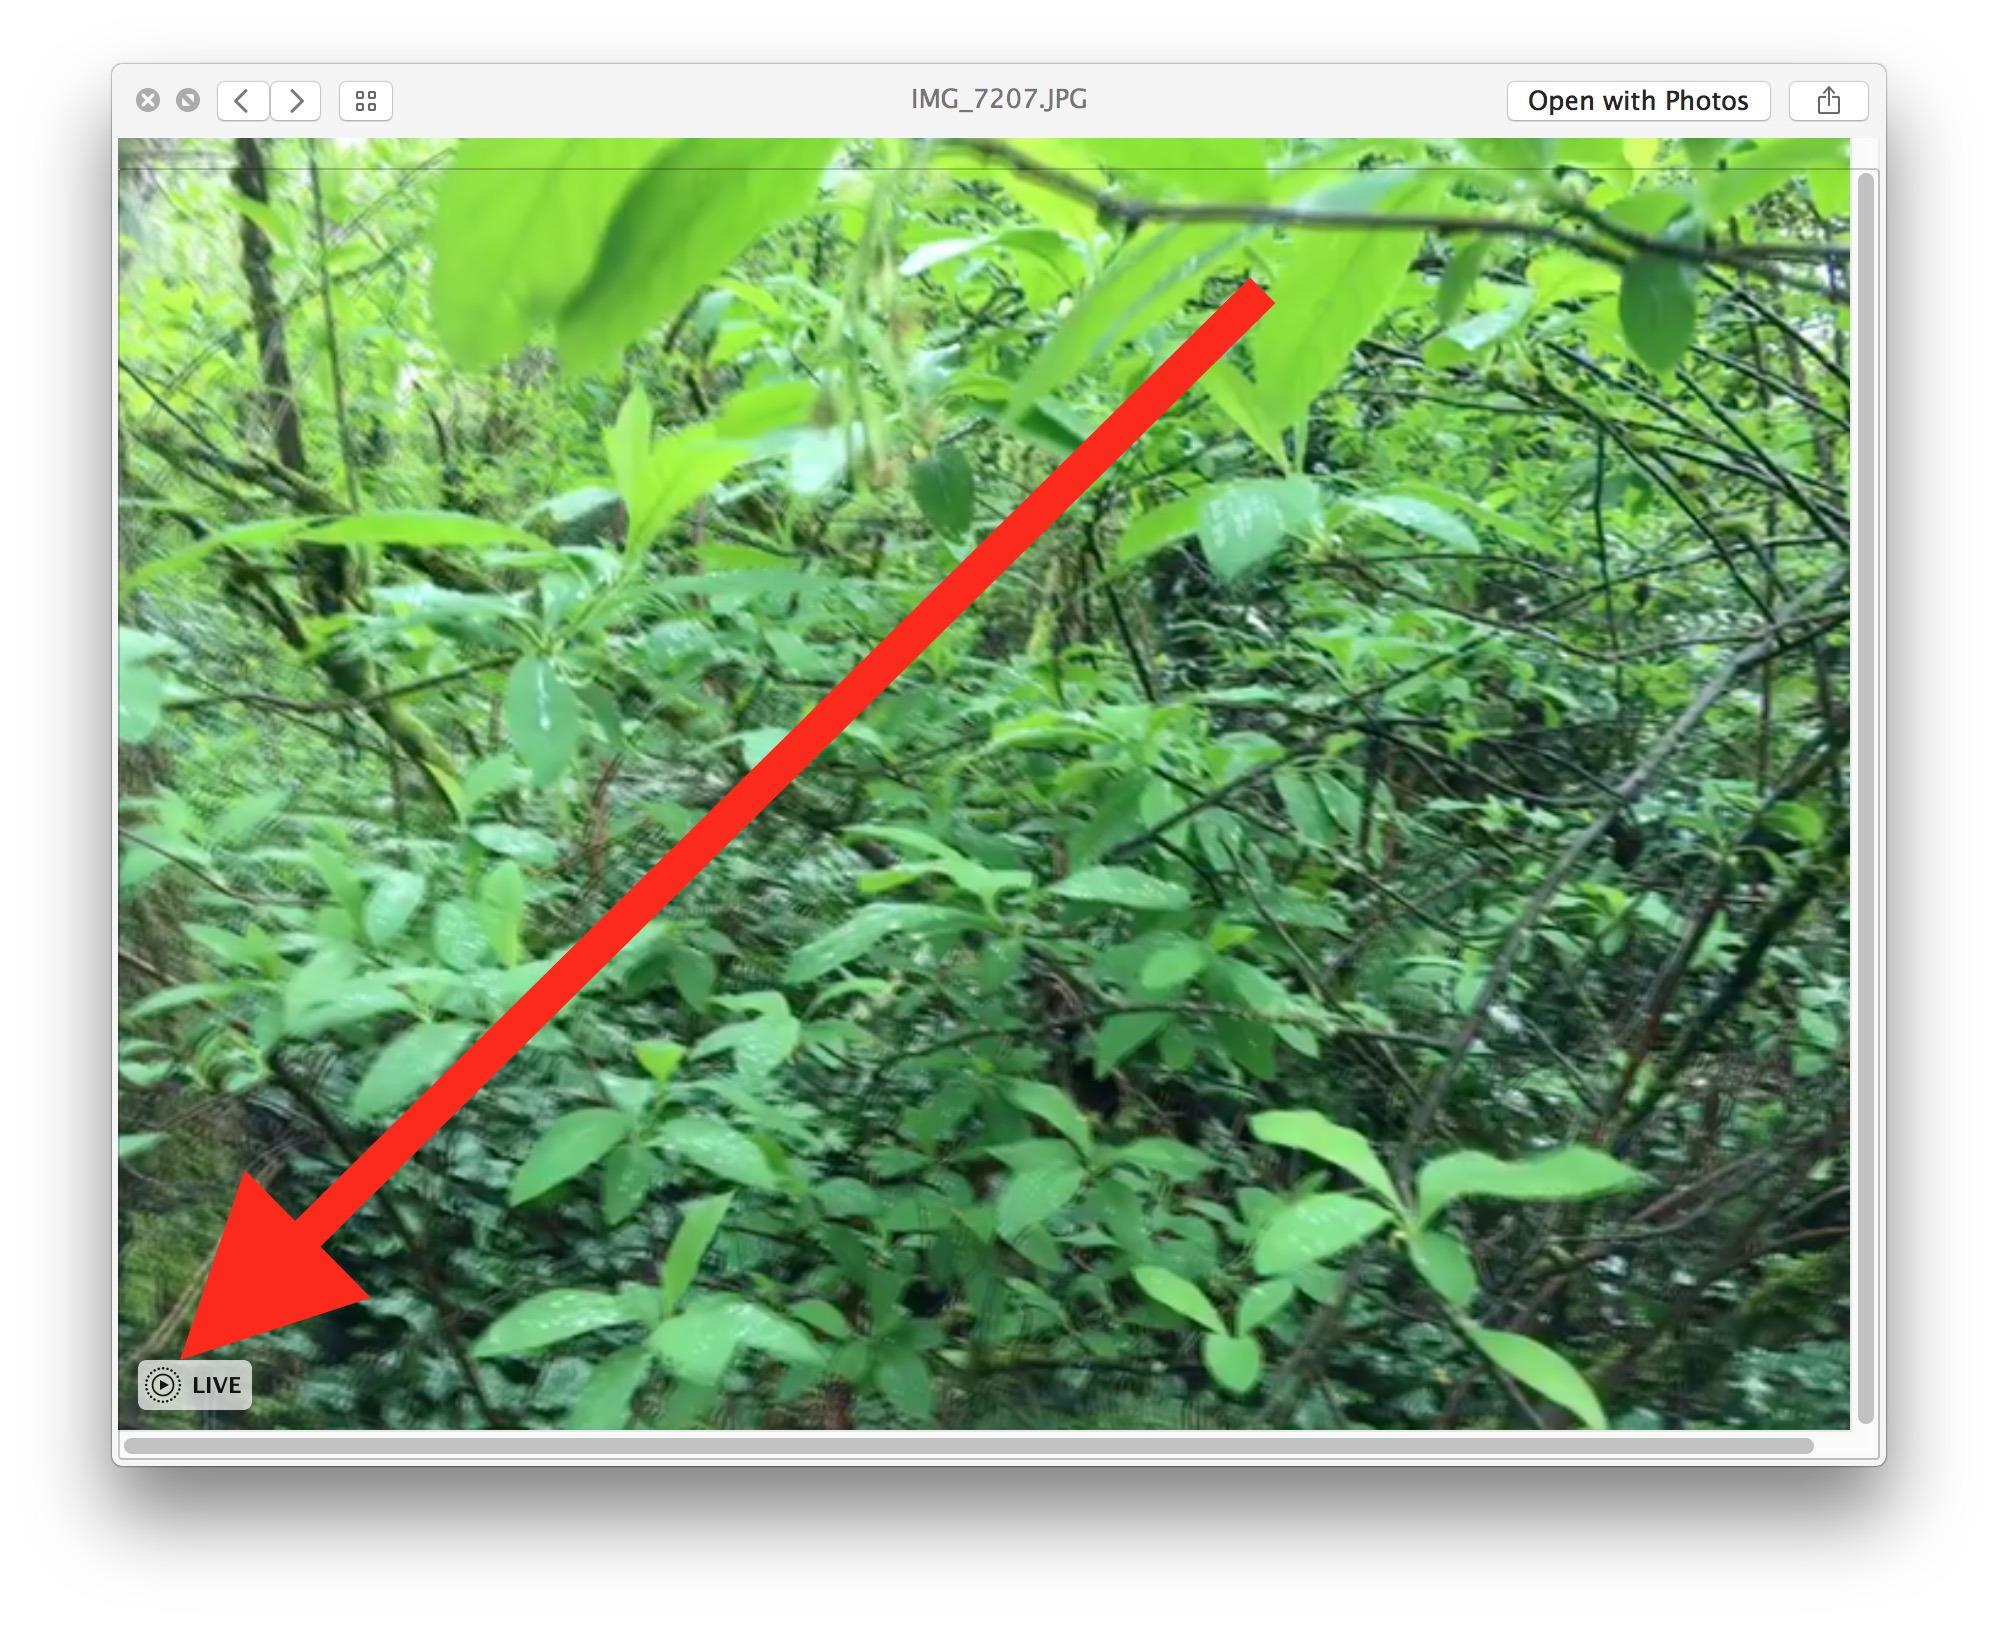 Riproduzione di una foto dal vivo in Messaggi per mac